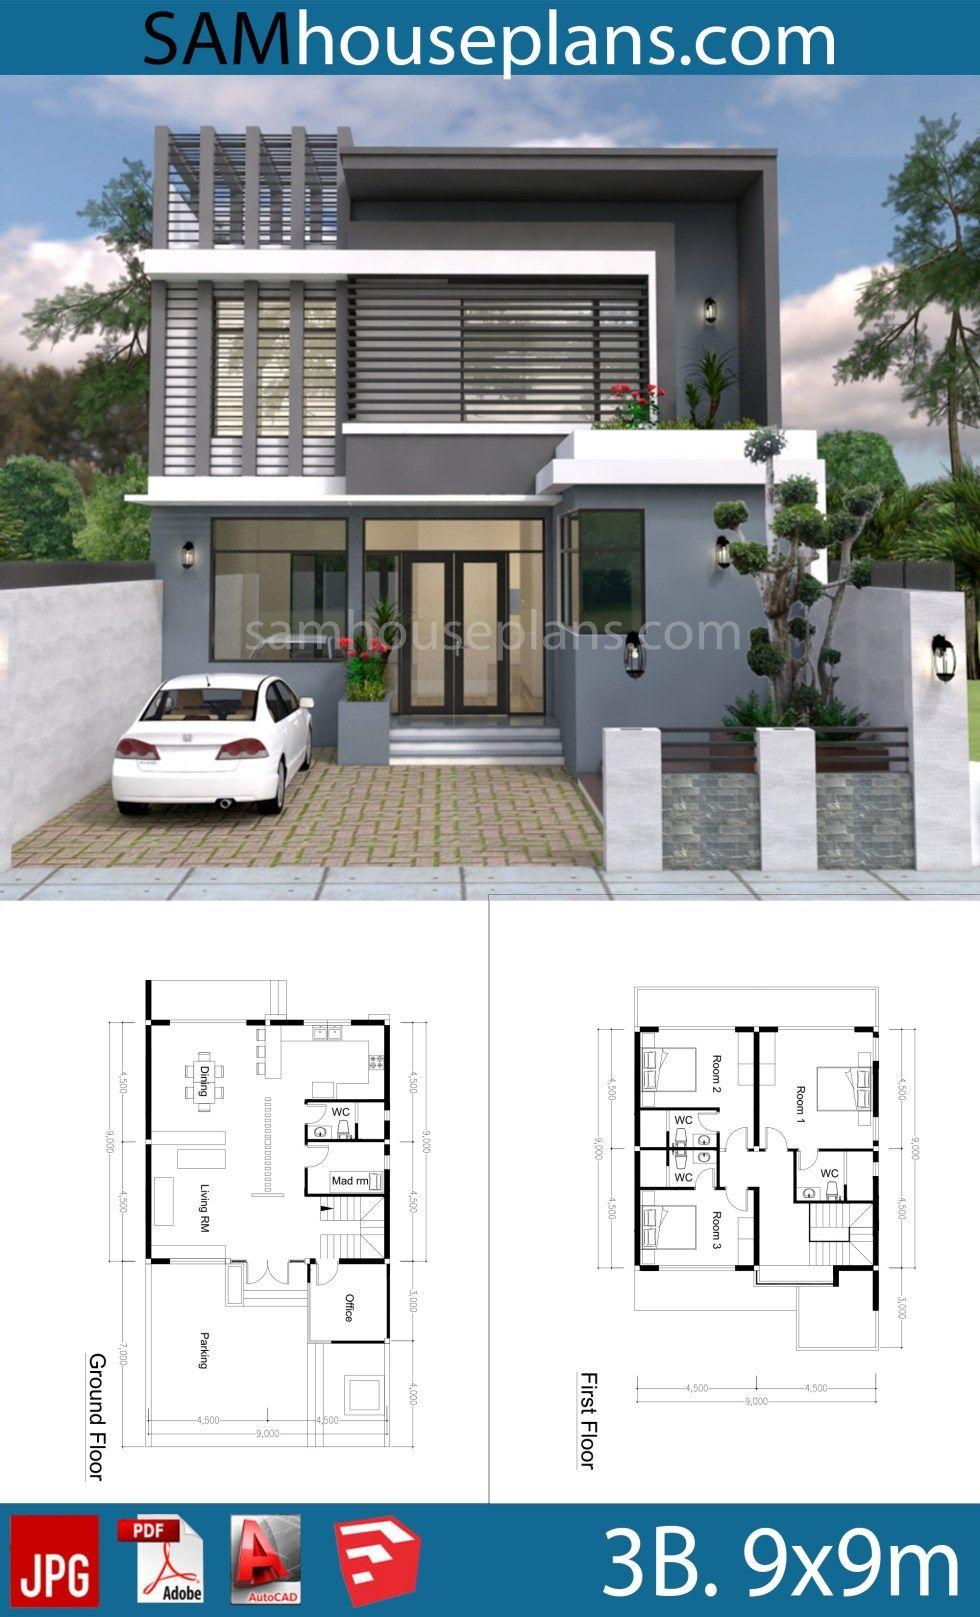 3 Bedroom Modern Home Plan 9x9m Sam House Plans Architectural House Plans Modern House Floor Plans Modern House Plans